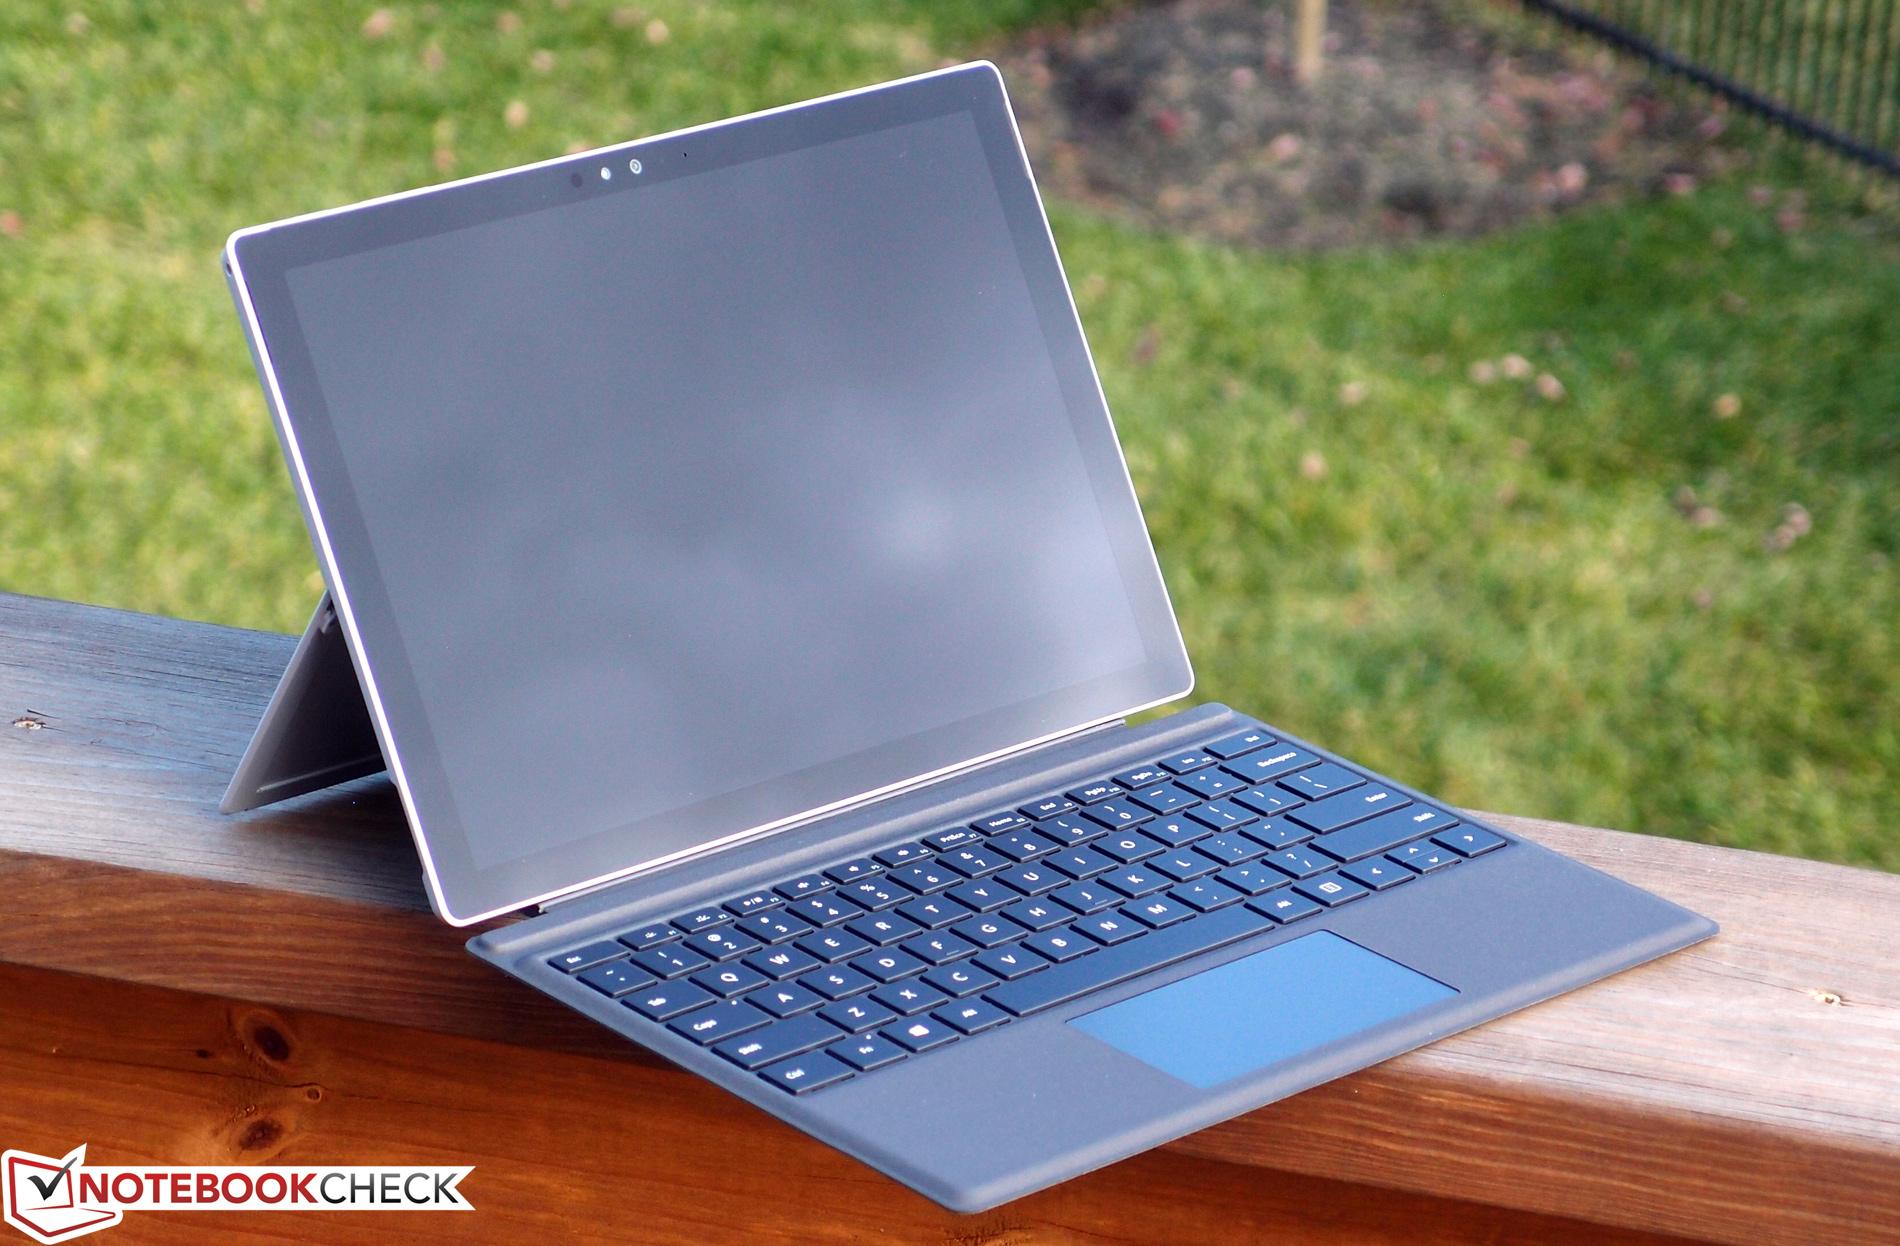 Critique Complte De La Tablette Microsoft Surface Pro 4 Core M3 I5 6300u 4gb Ram 128gb Ssd 2736x1824 Muluss Full Resolution Book